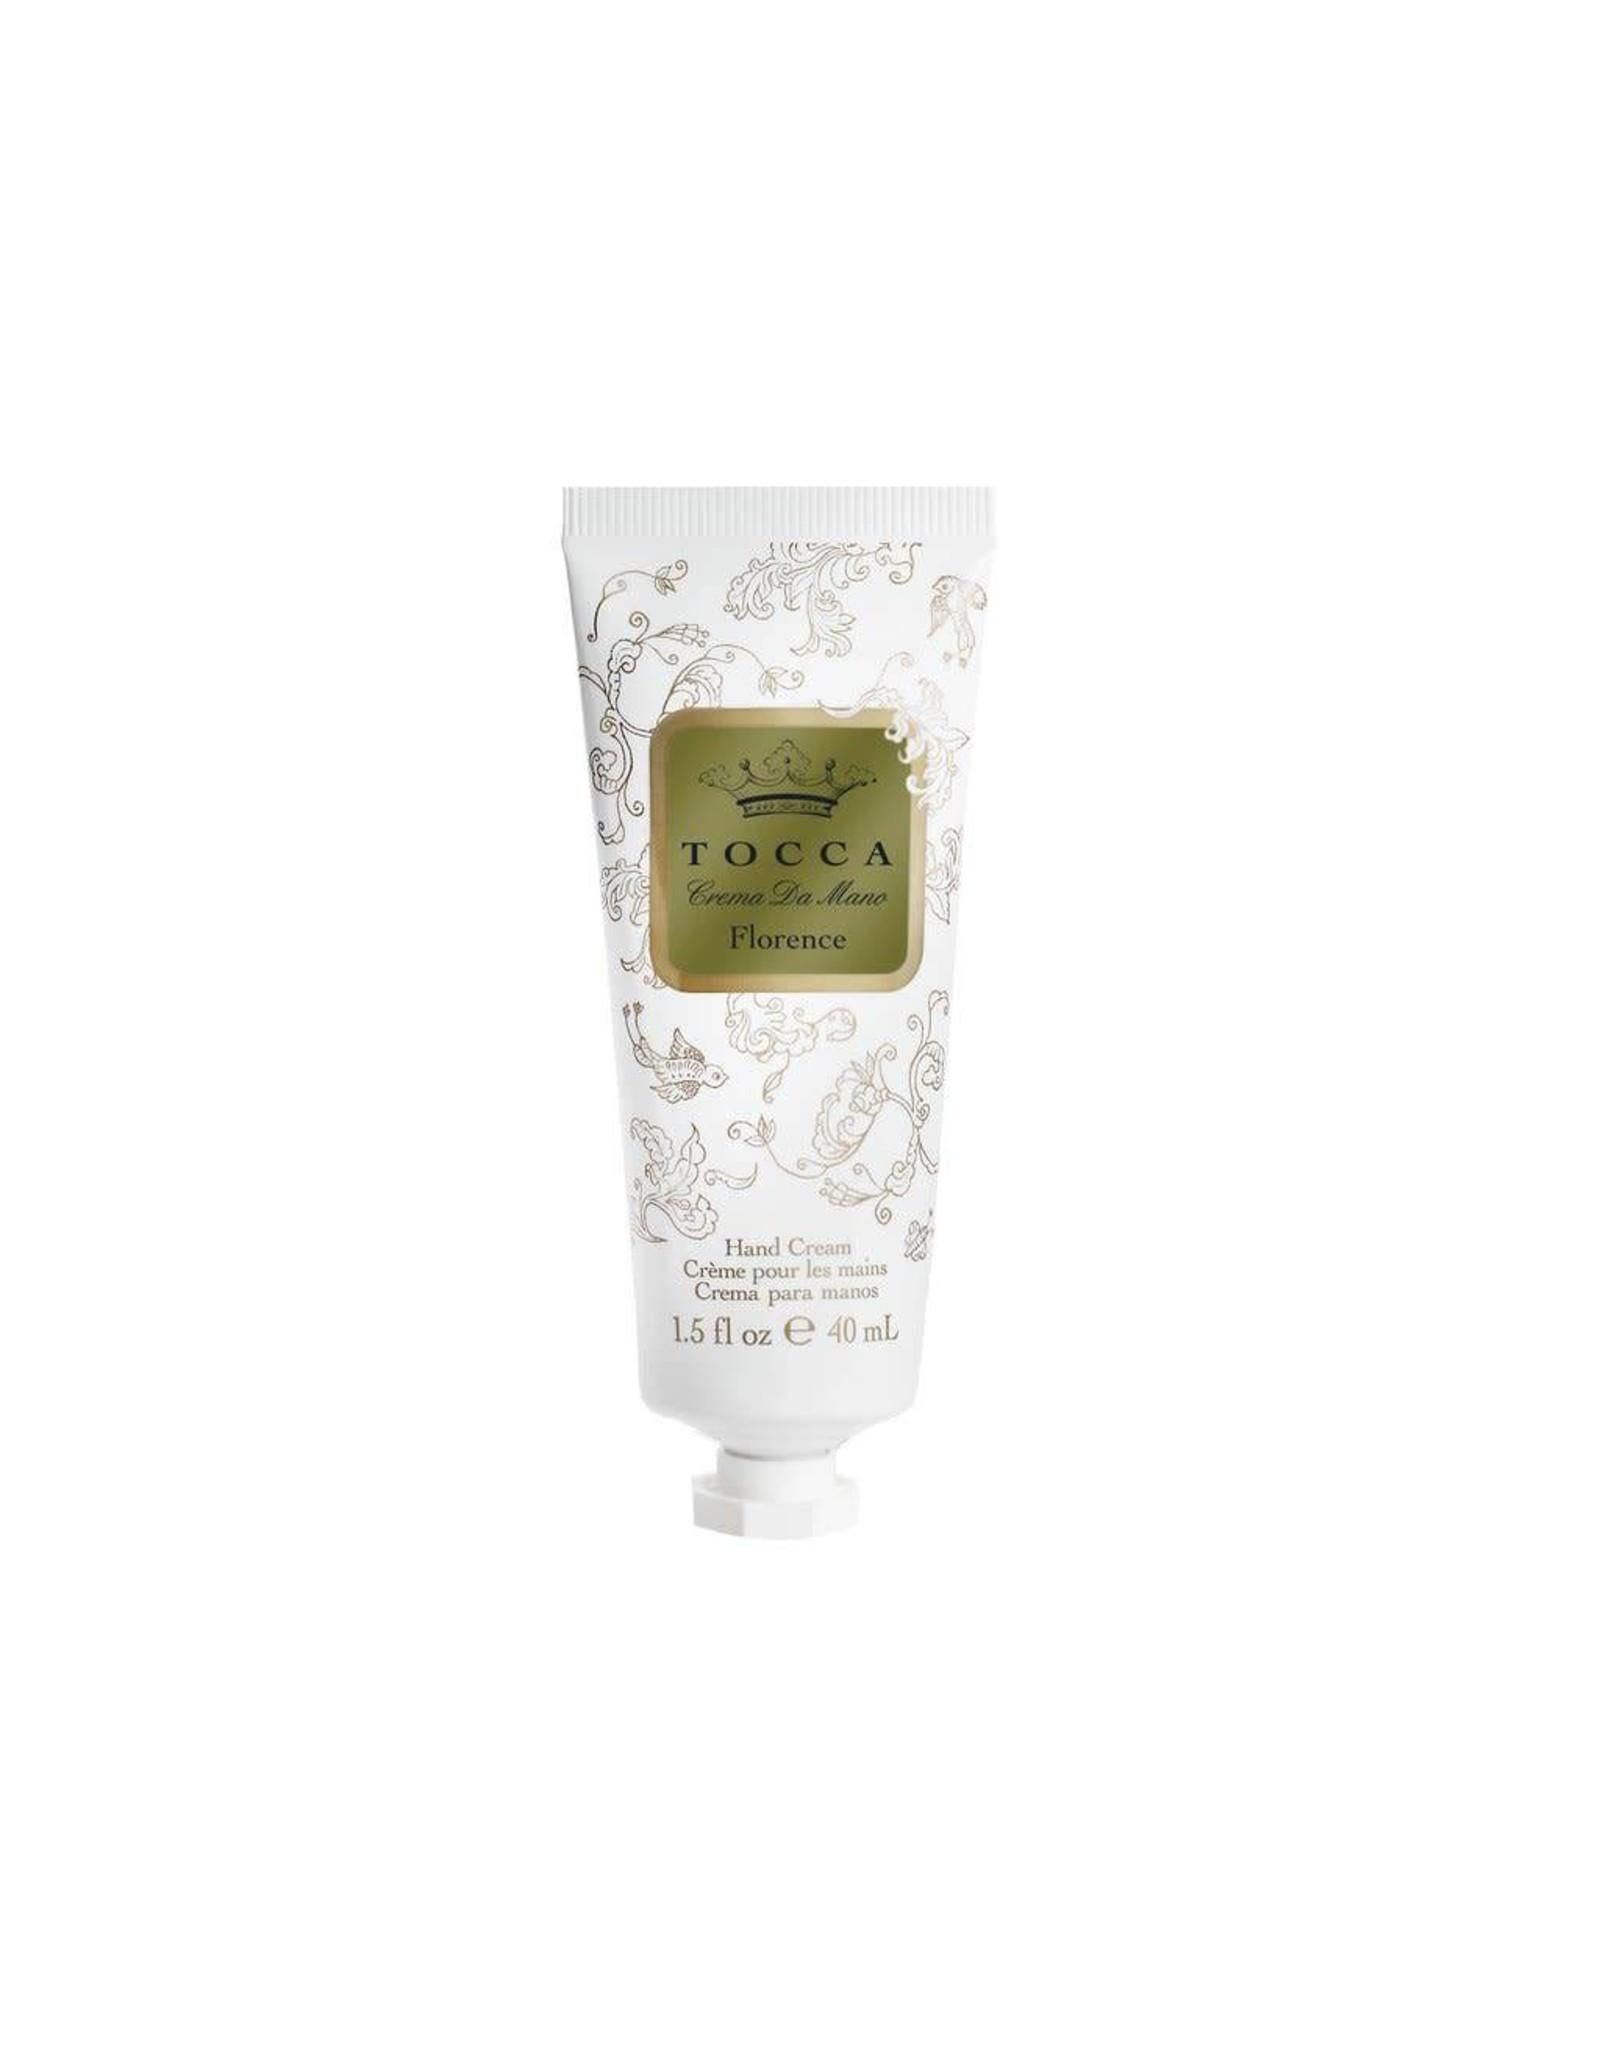 Tocca 1.5 OZ Travel Hand Cream